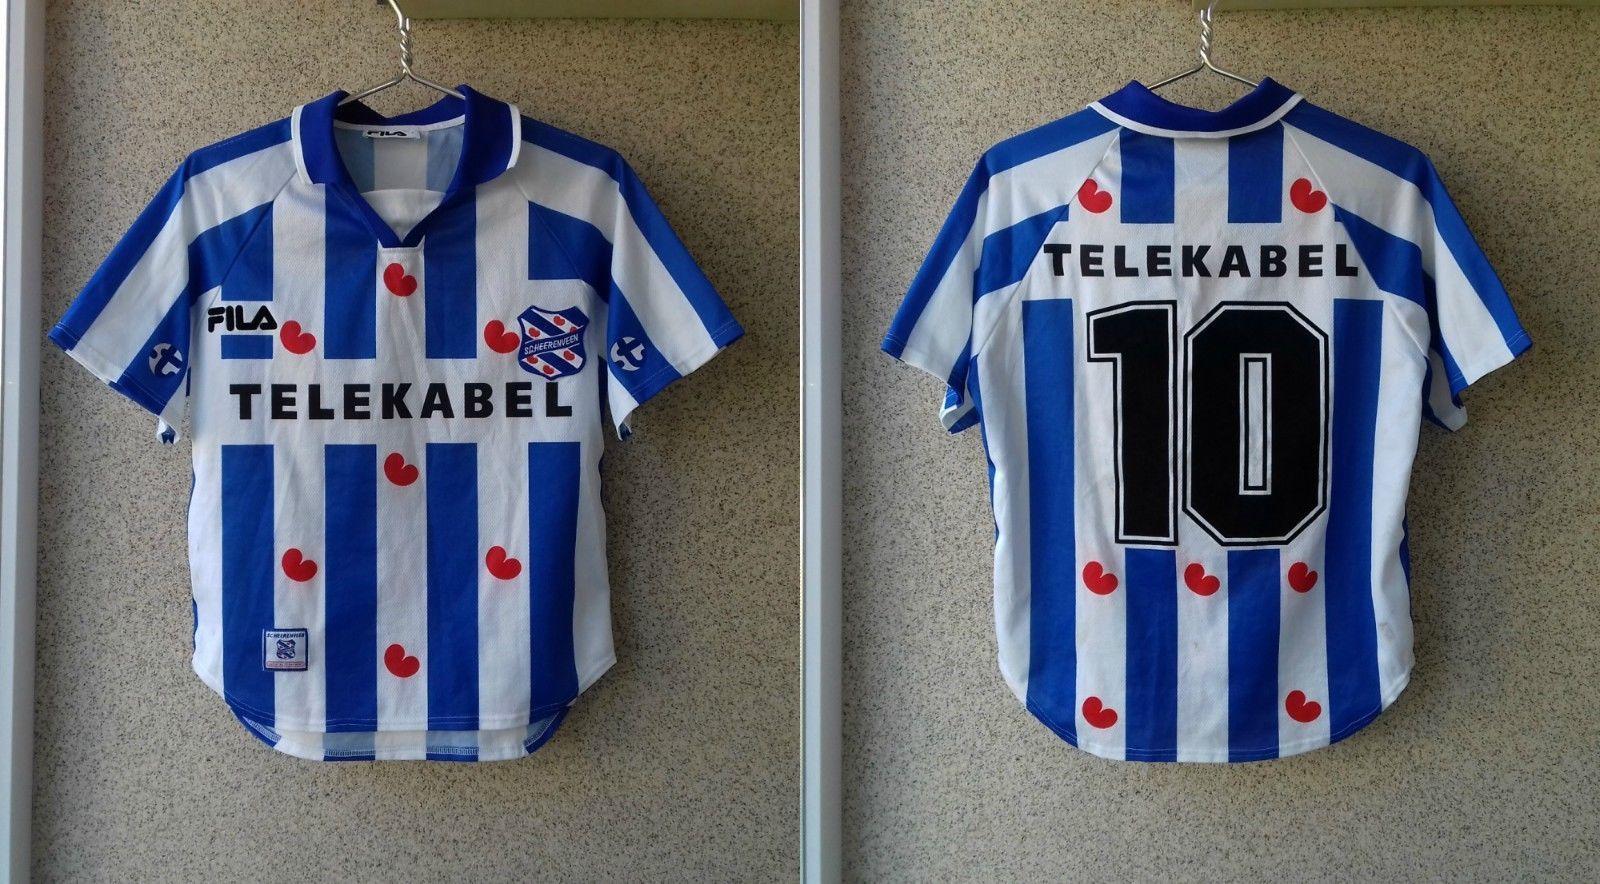 SC Heerenveen 1999 2000 Home football shirt S Jersey Soccer FILA Camiseta  OLD (eBay Link) 63a029695